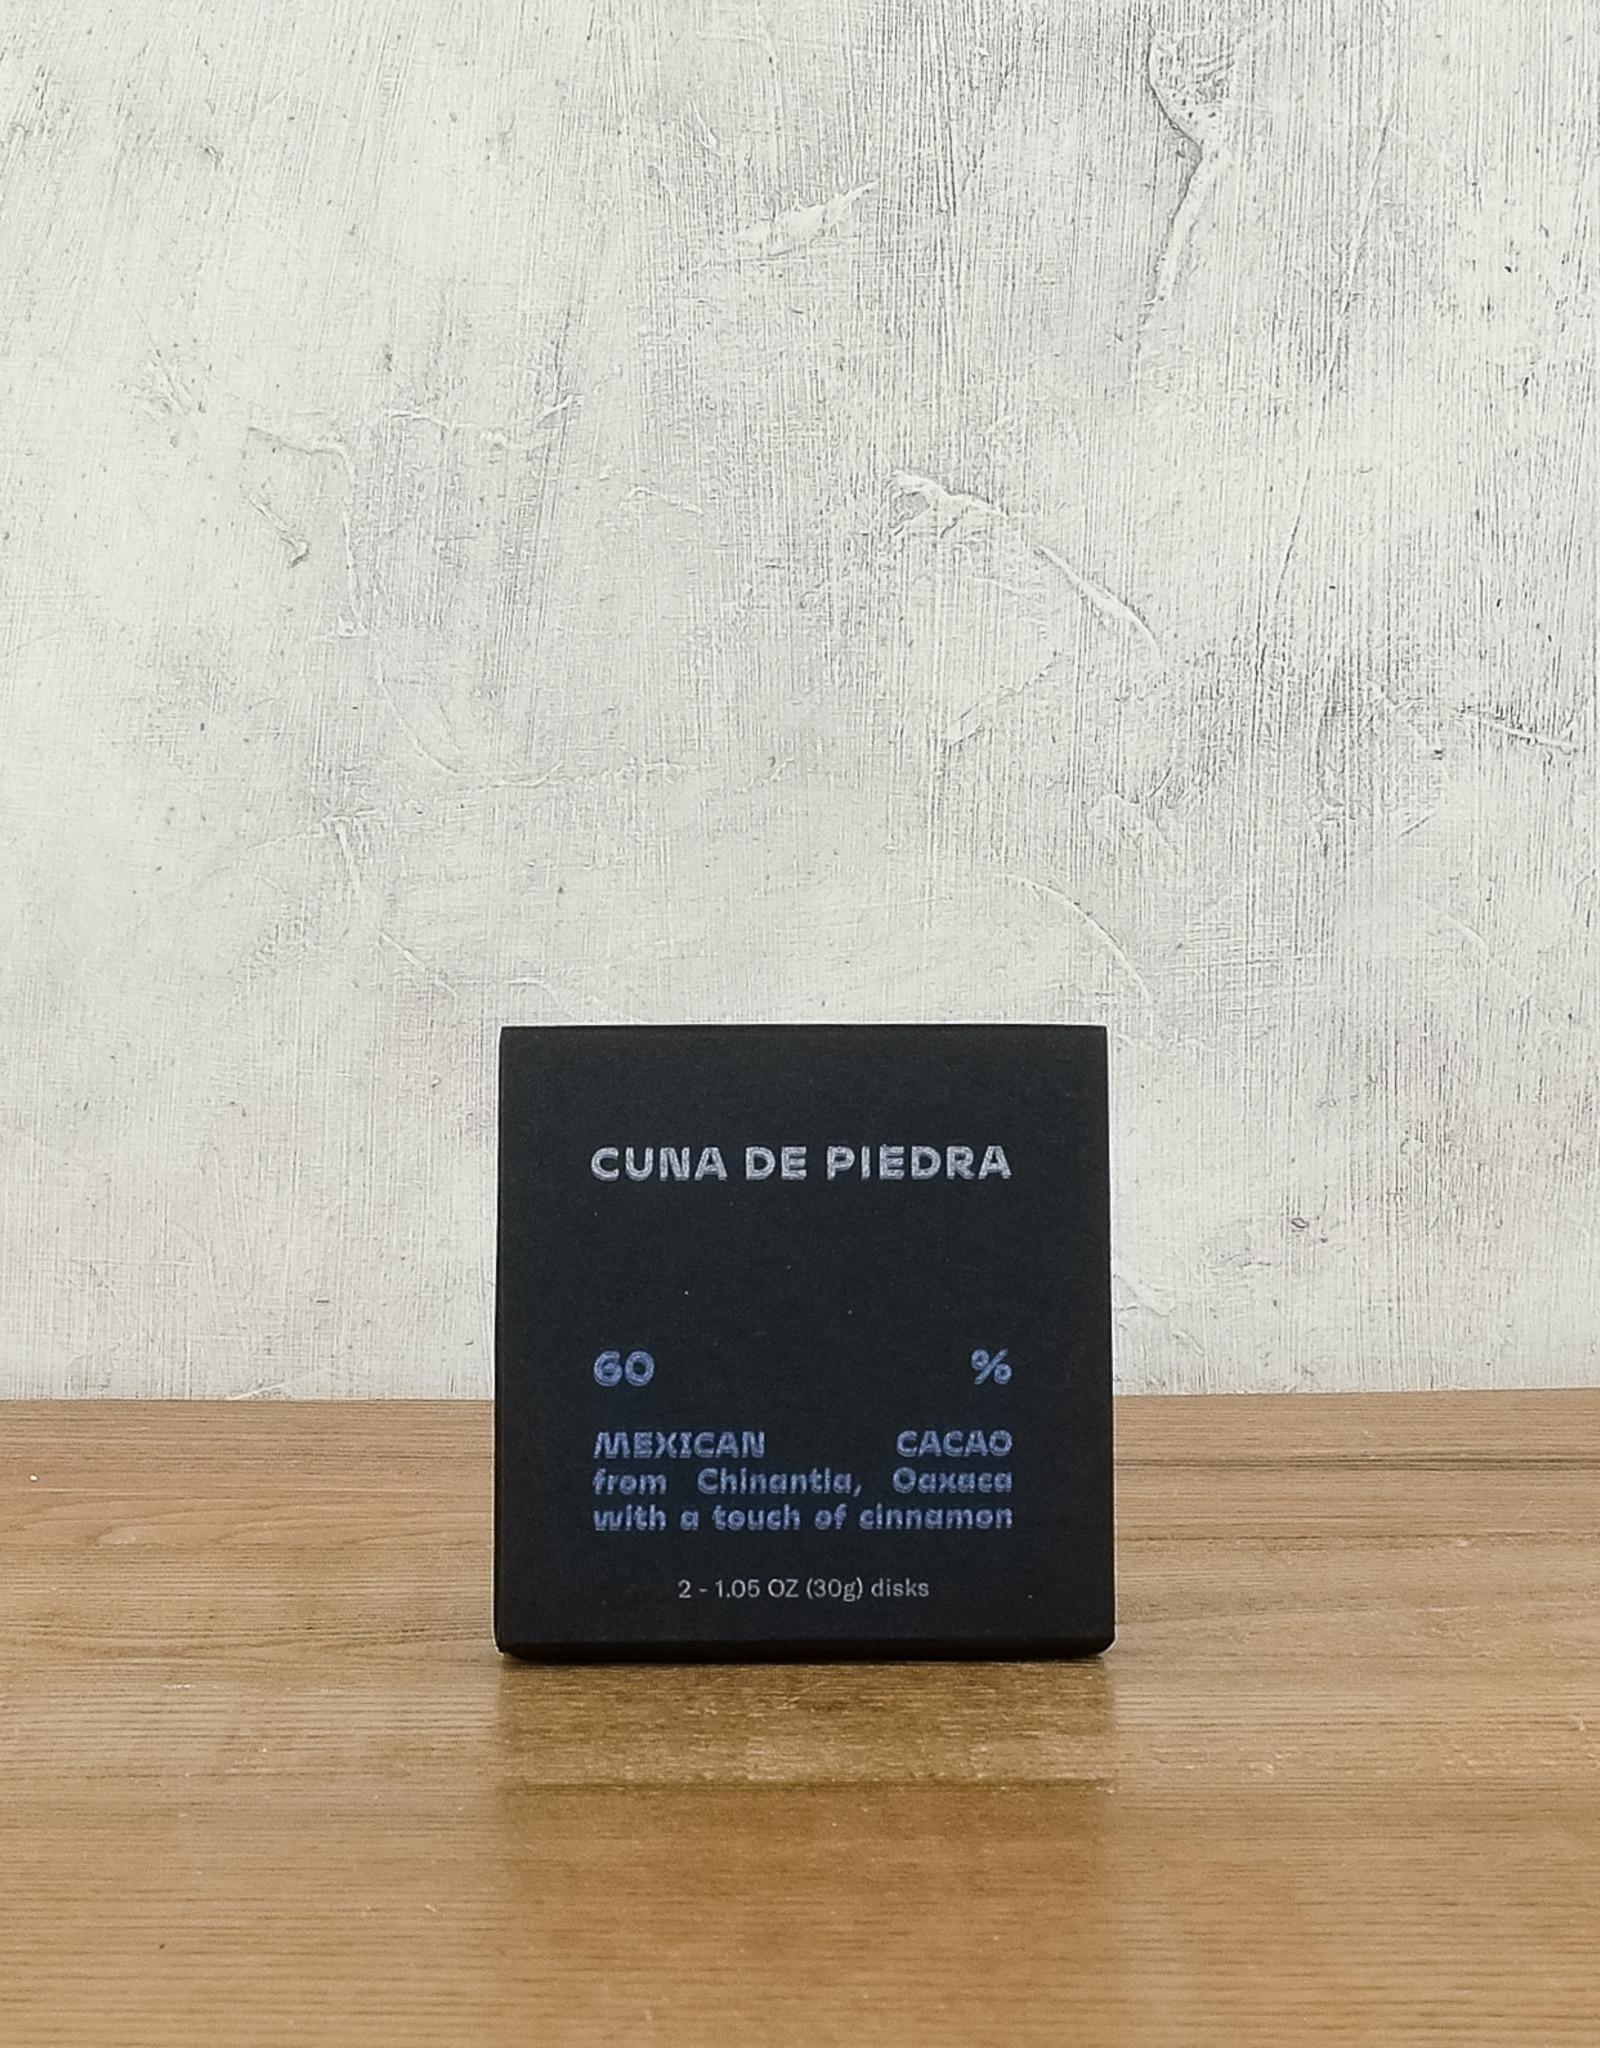 Cuna de Piedra Drinking Chocolate with Cinnamon